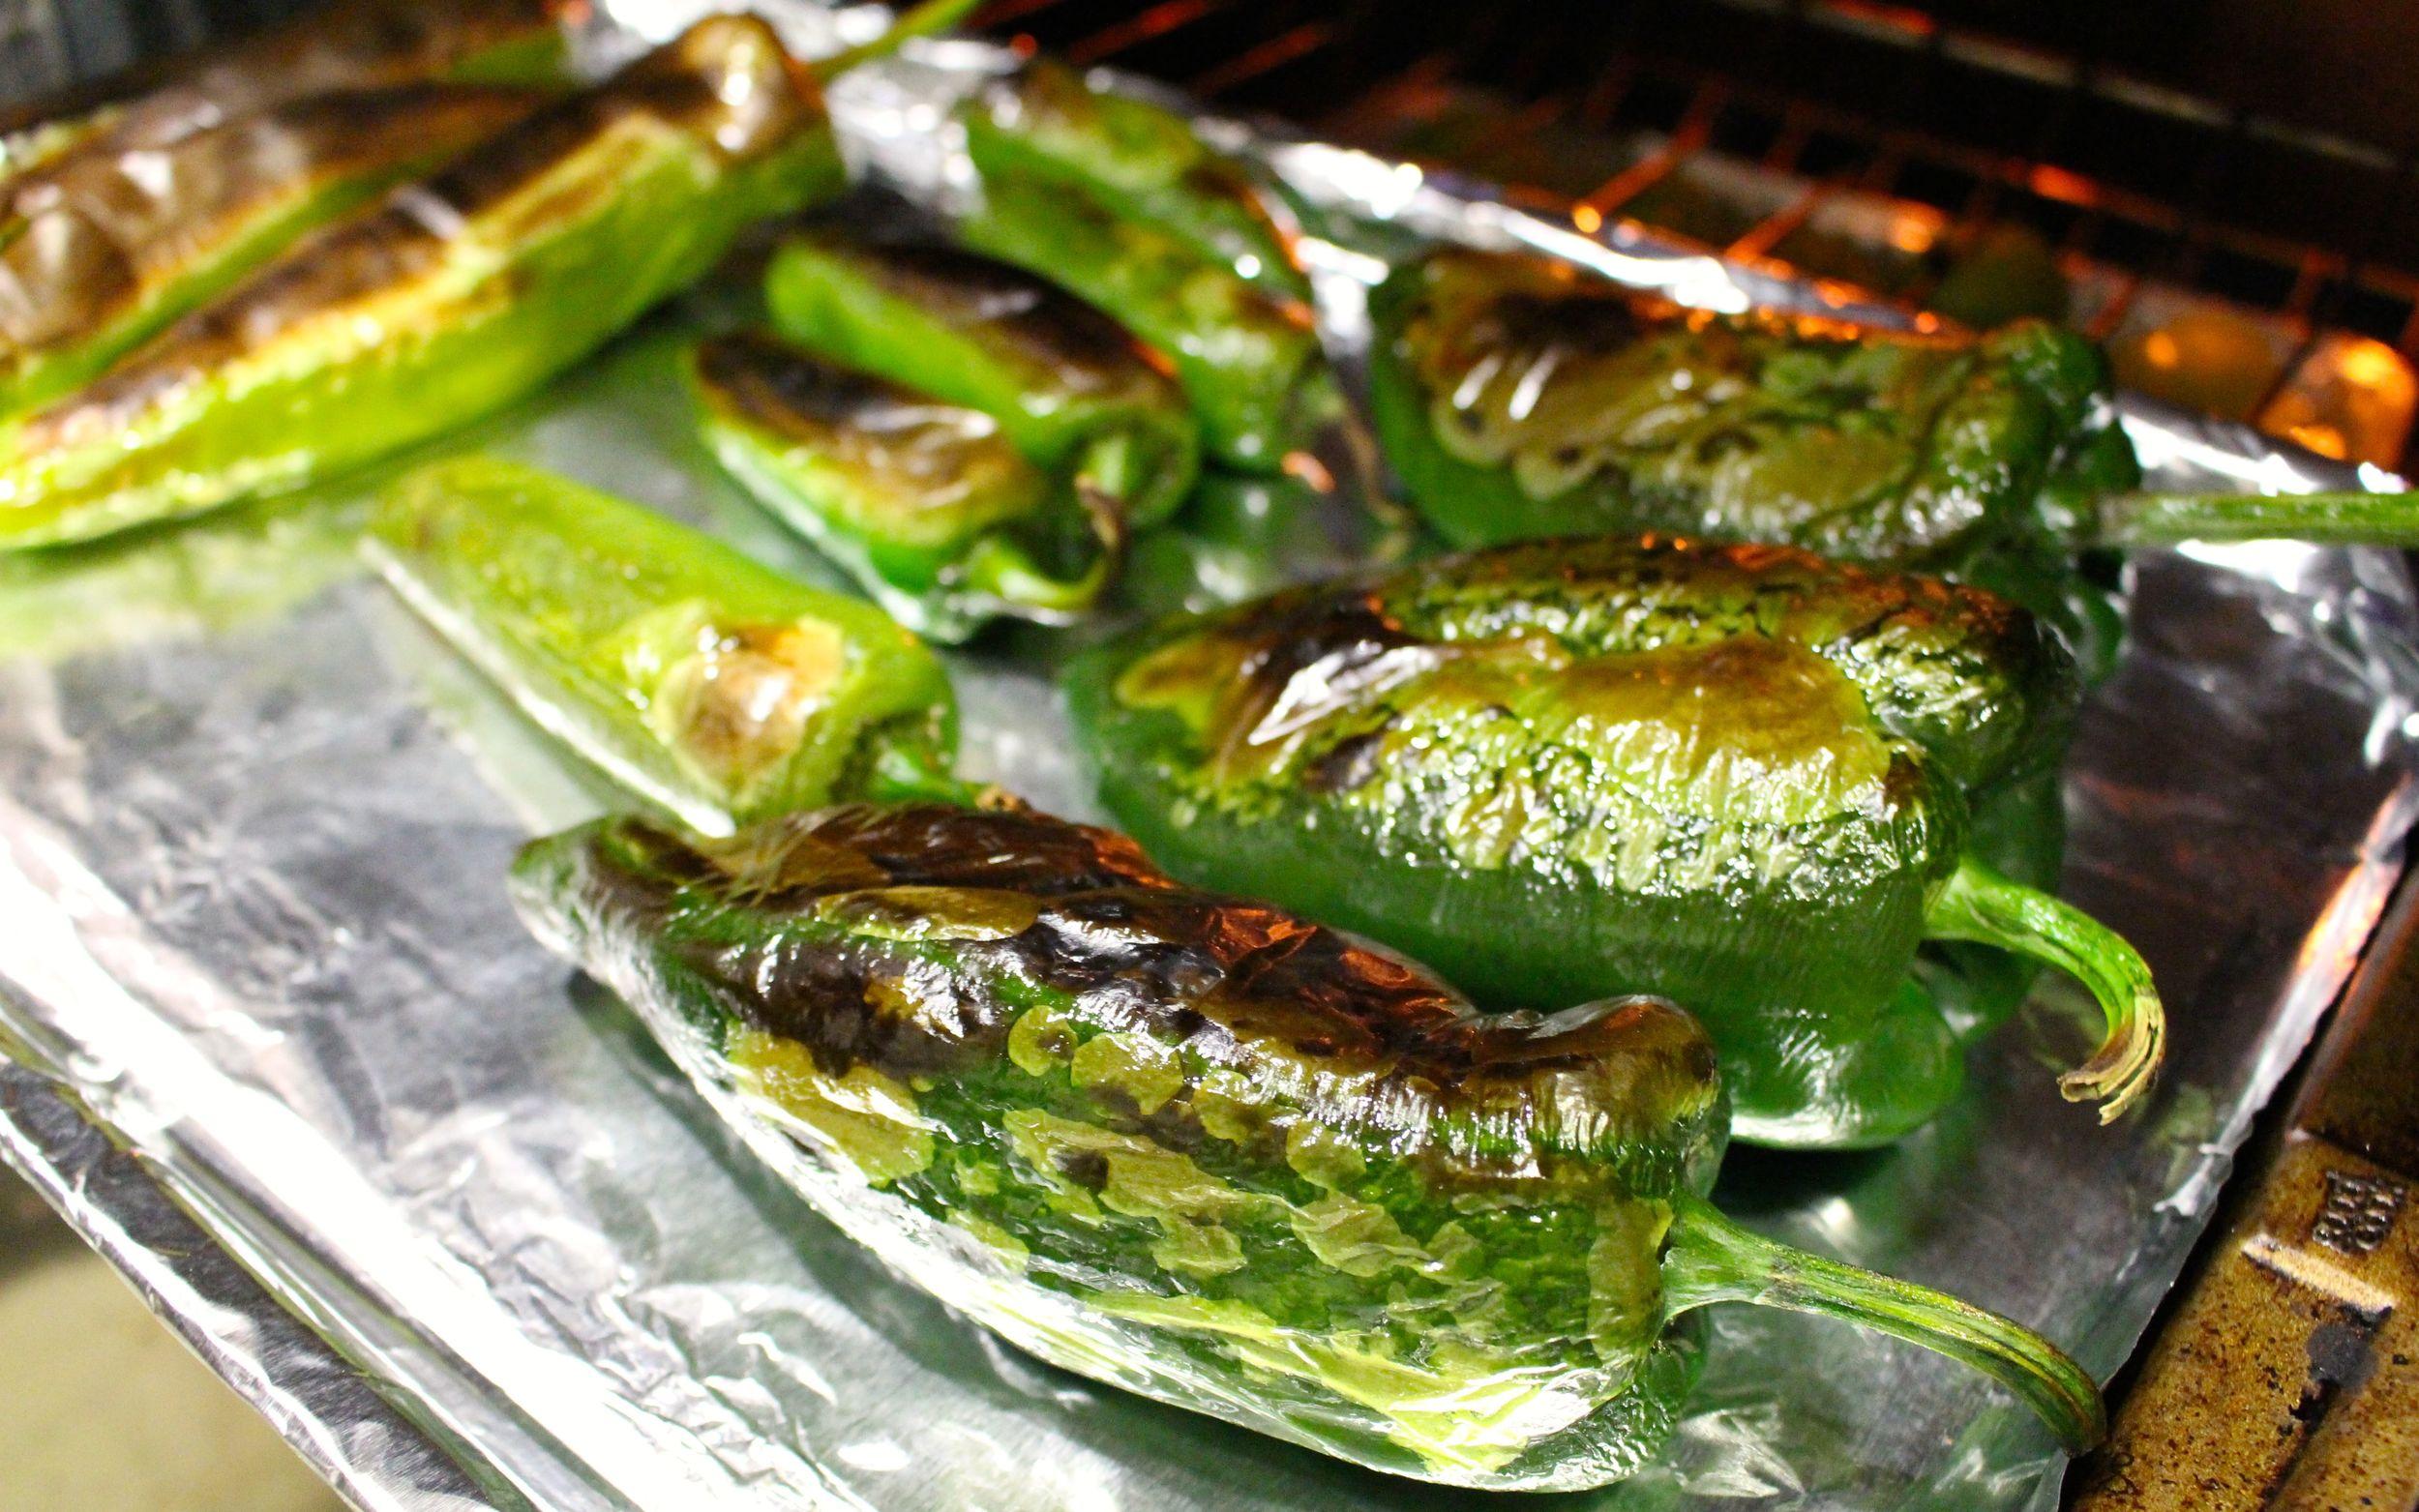 roasting green chili.jpg